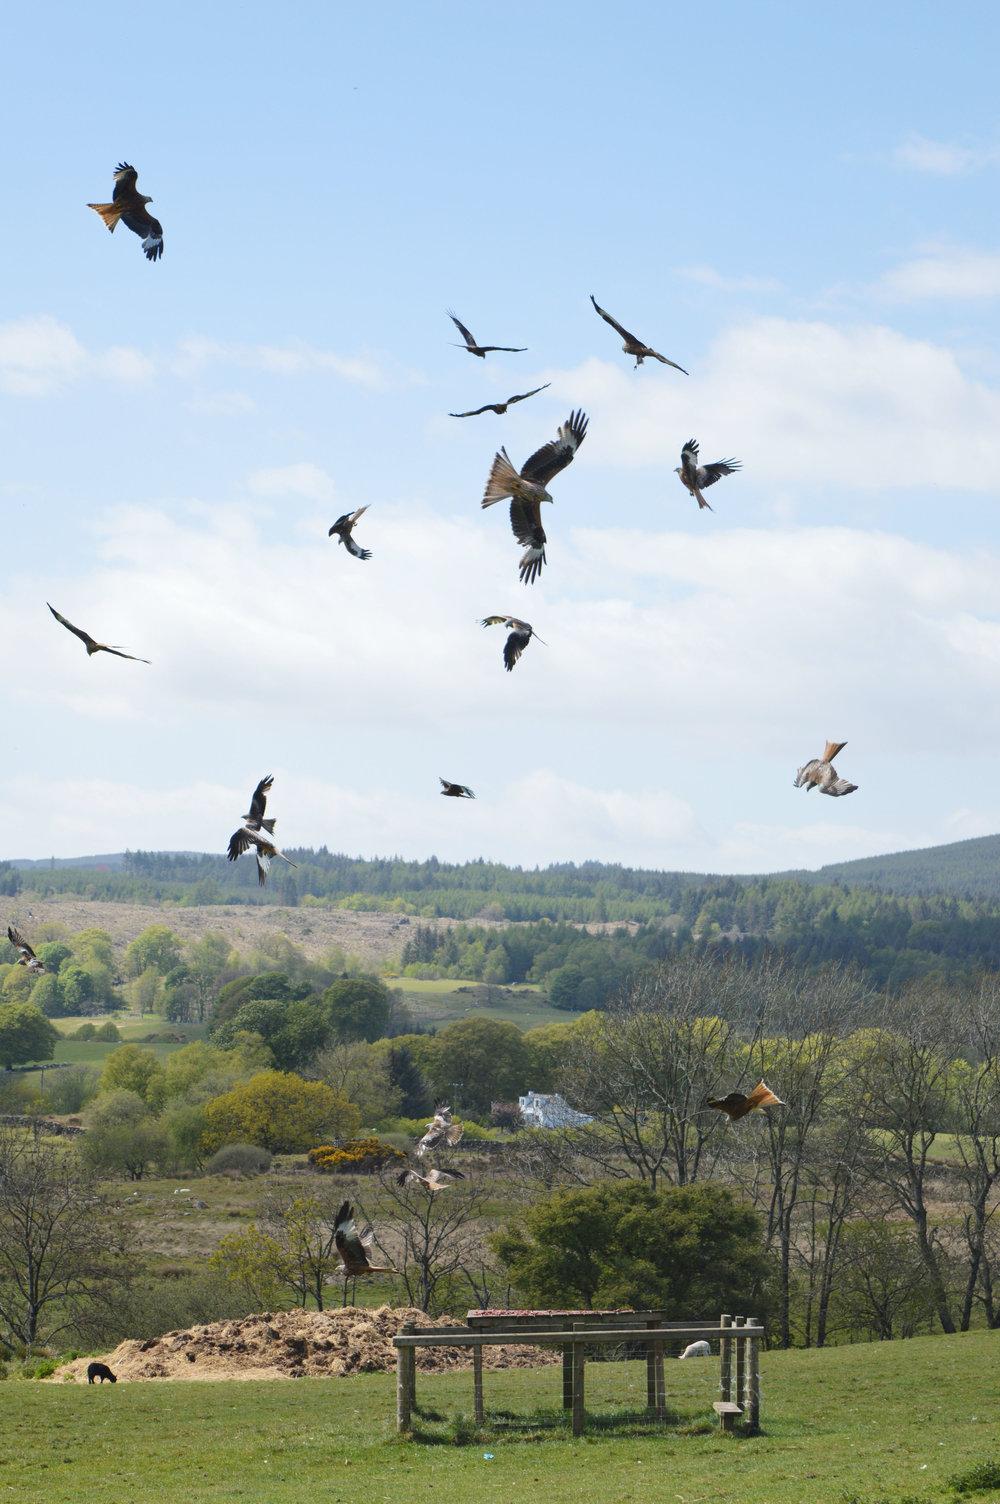 Bellymack Hill Farm - Kite Feeding Station